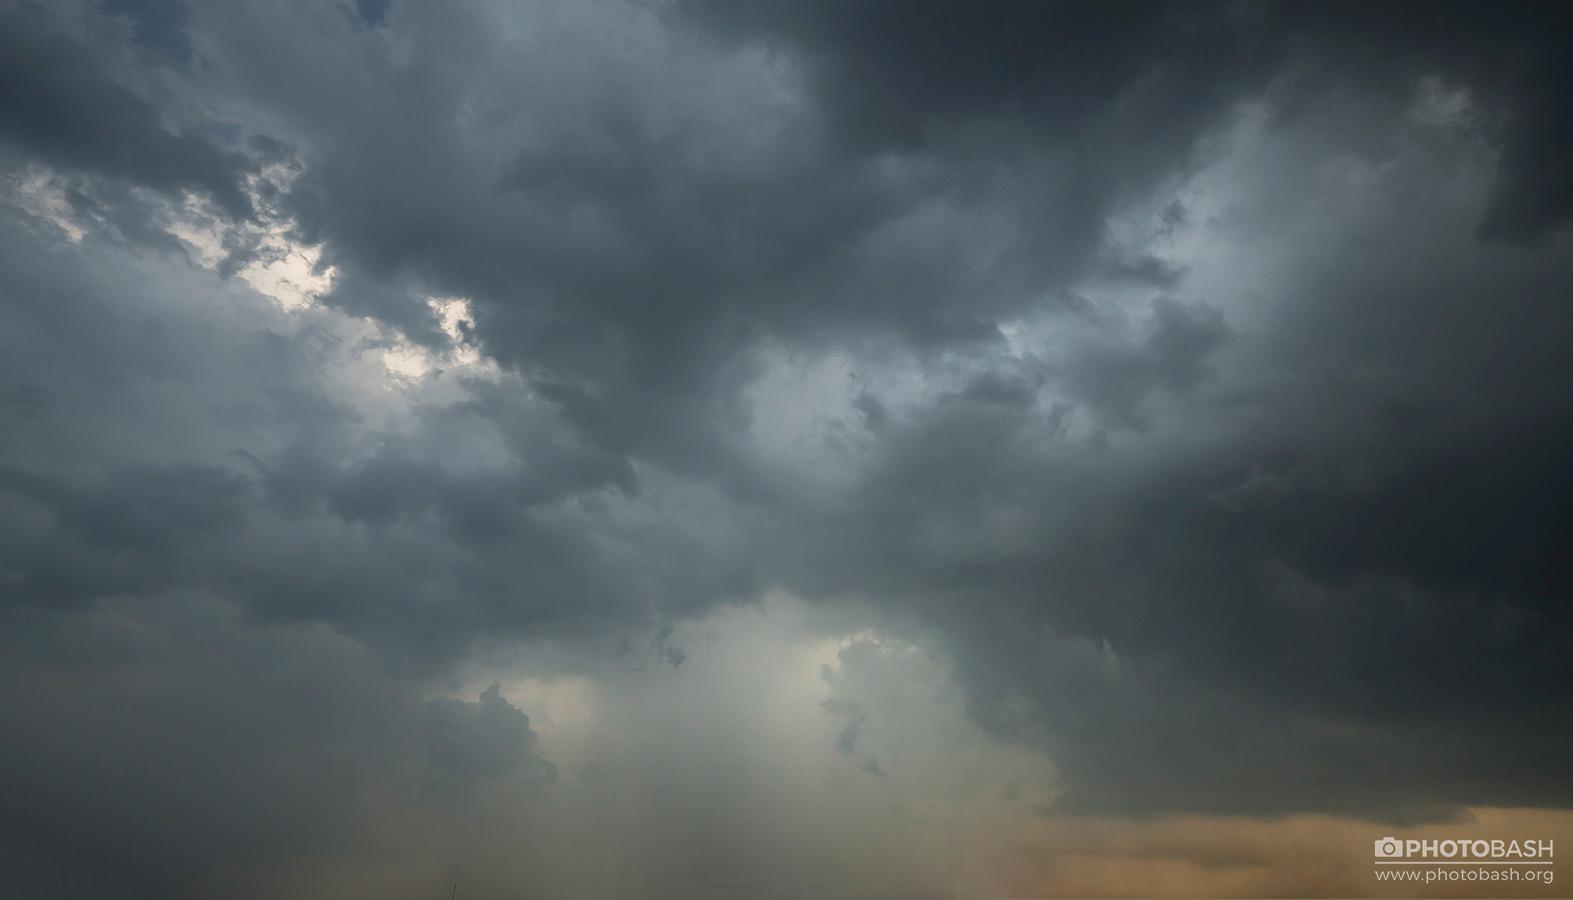 Dramatic-Skies-Stormy-Dusk-Sky.jpg